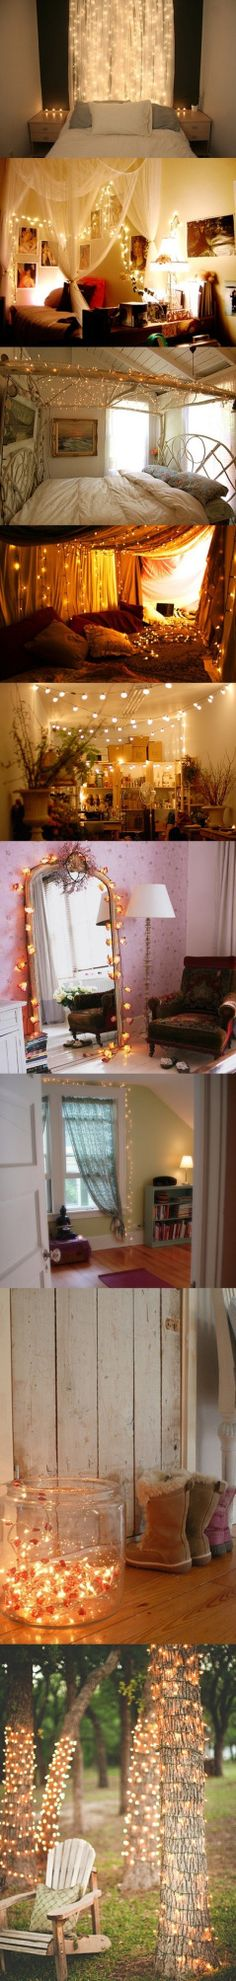 Beautiful bedroom inspirations [ PlankWood.com ] #bedroom #plank #wood